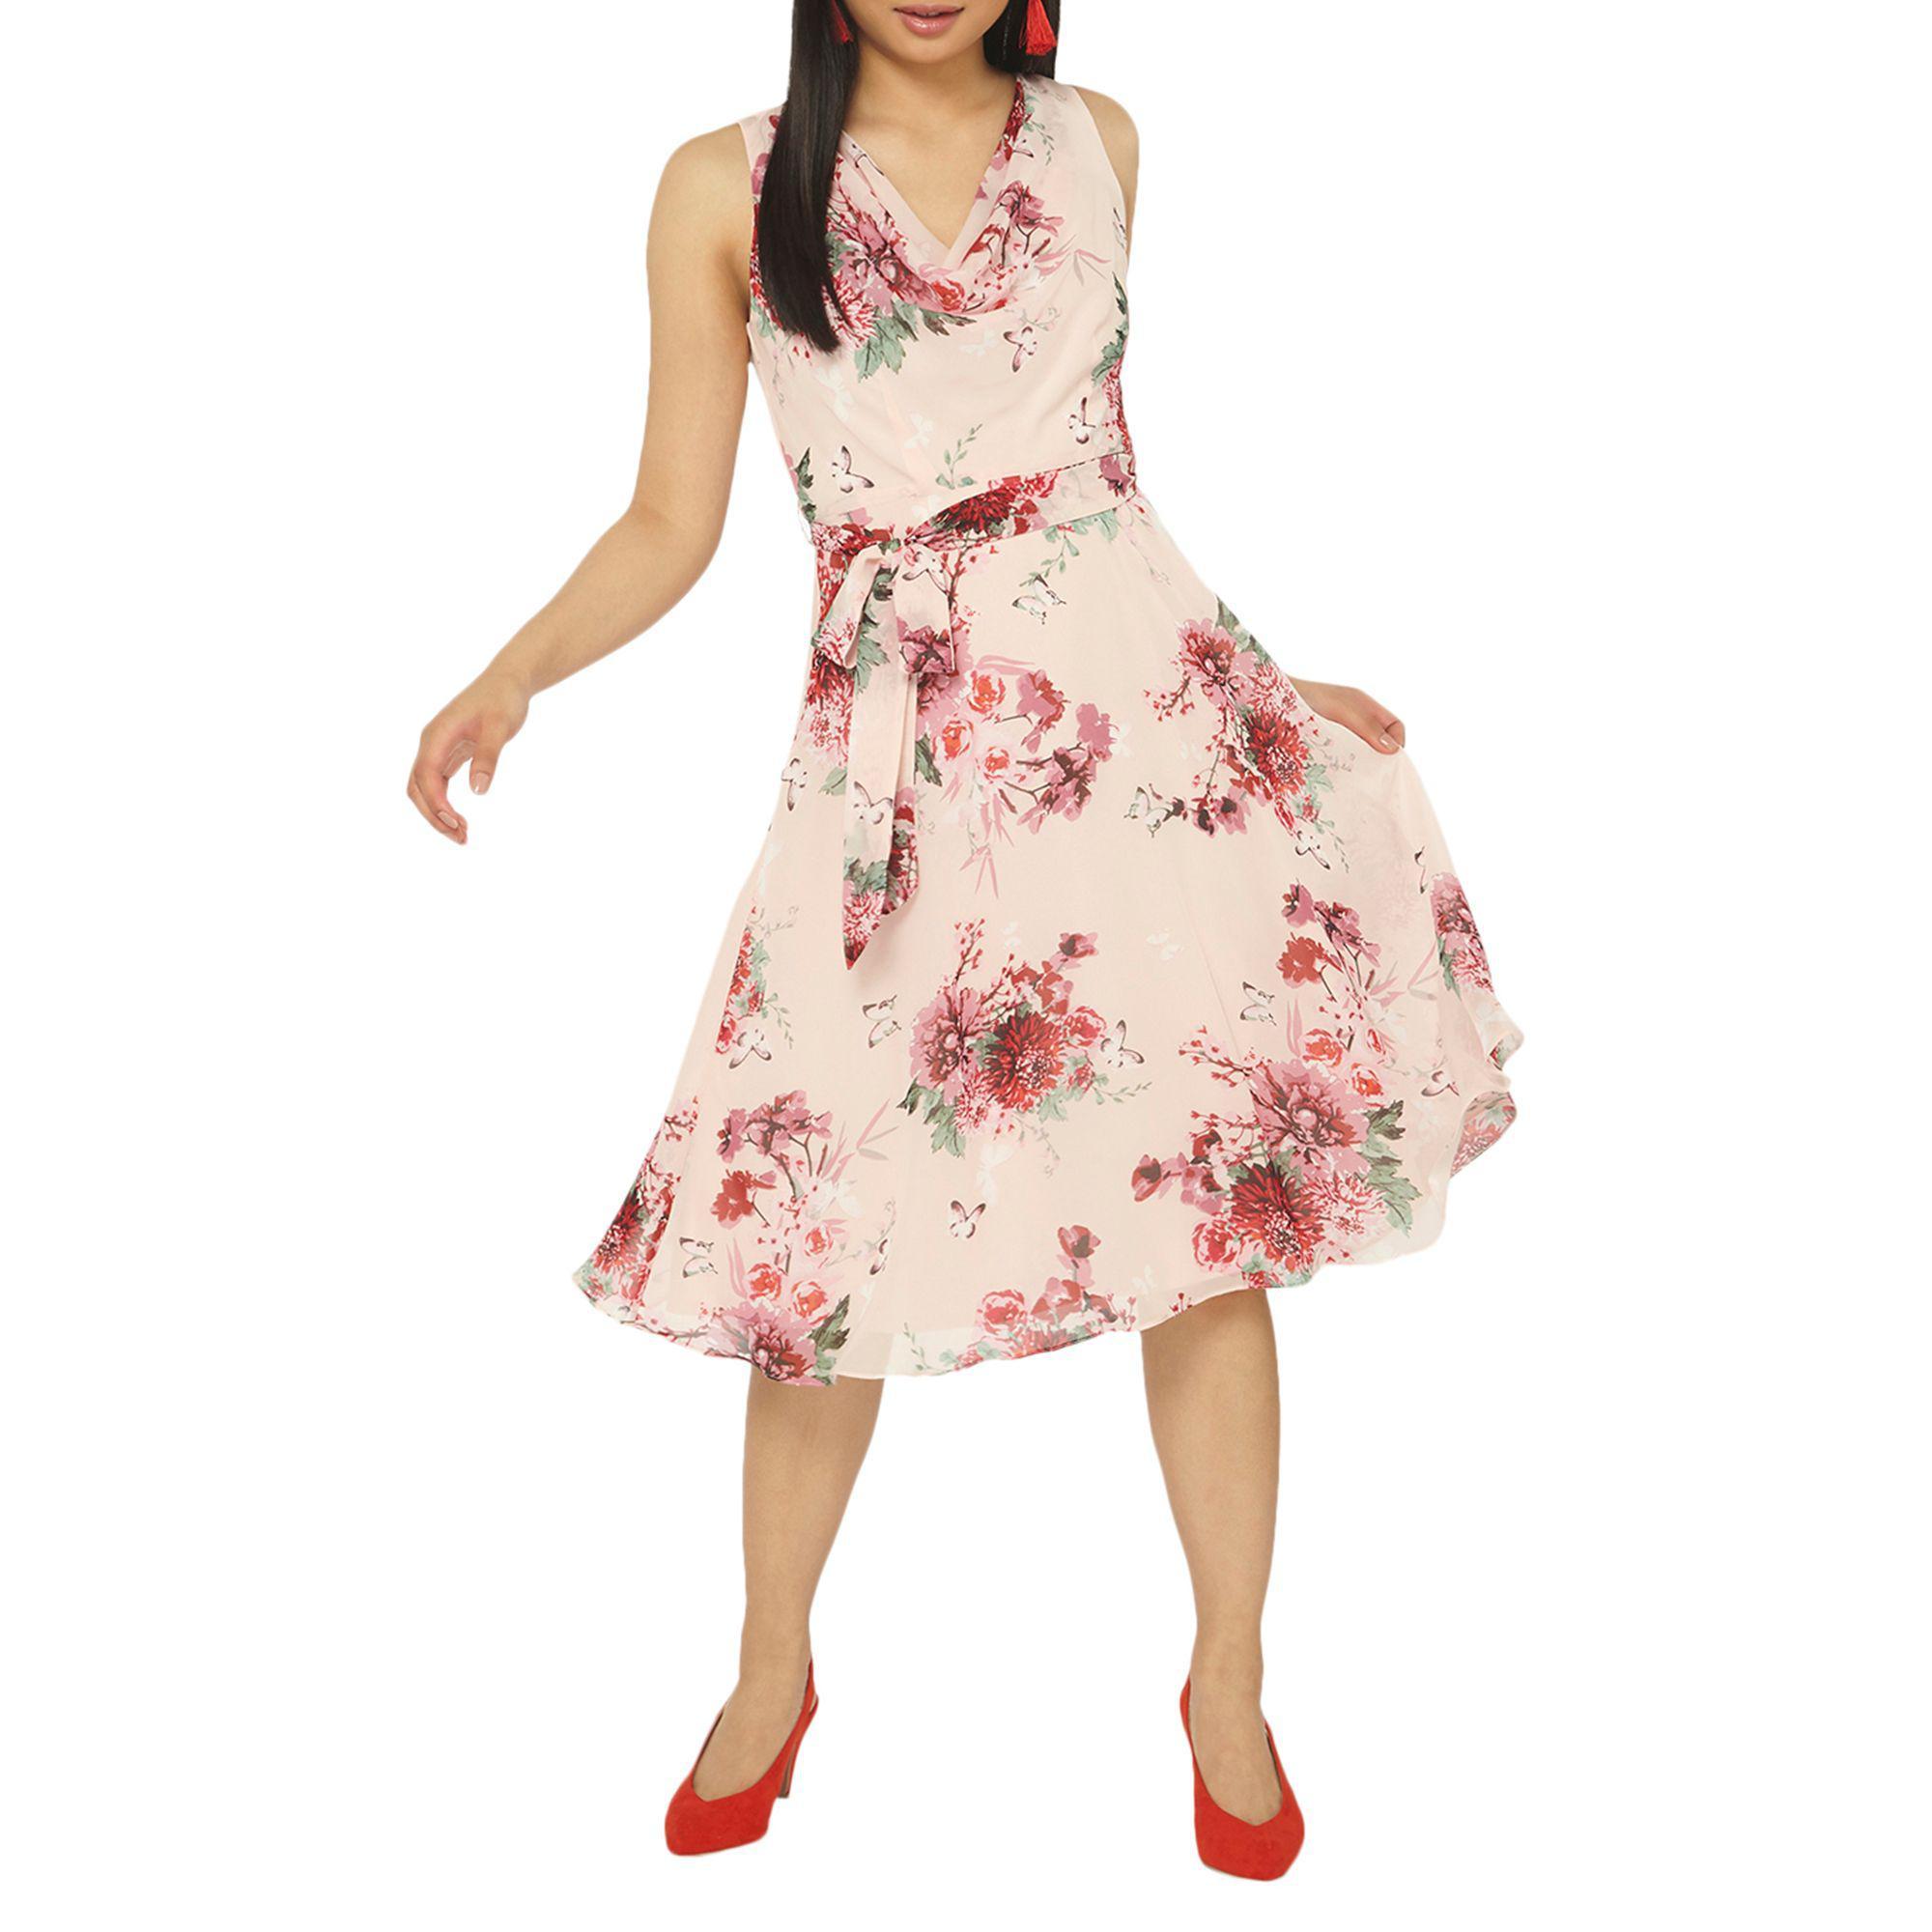 5d288bef6d2a1 Dorothy Perkins Billie   Blossom Petite Blush Floral Print Skater ...